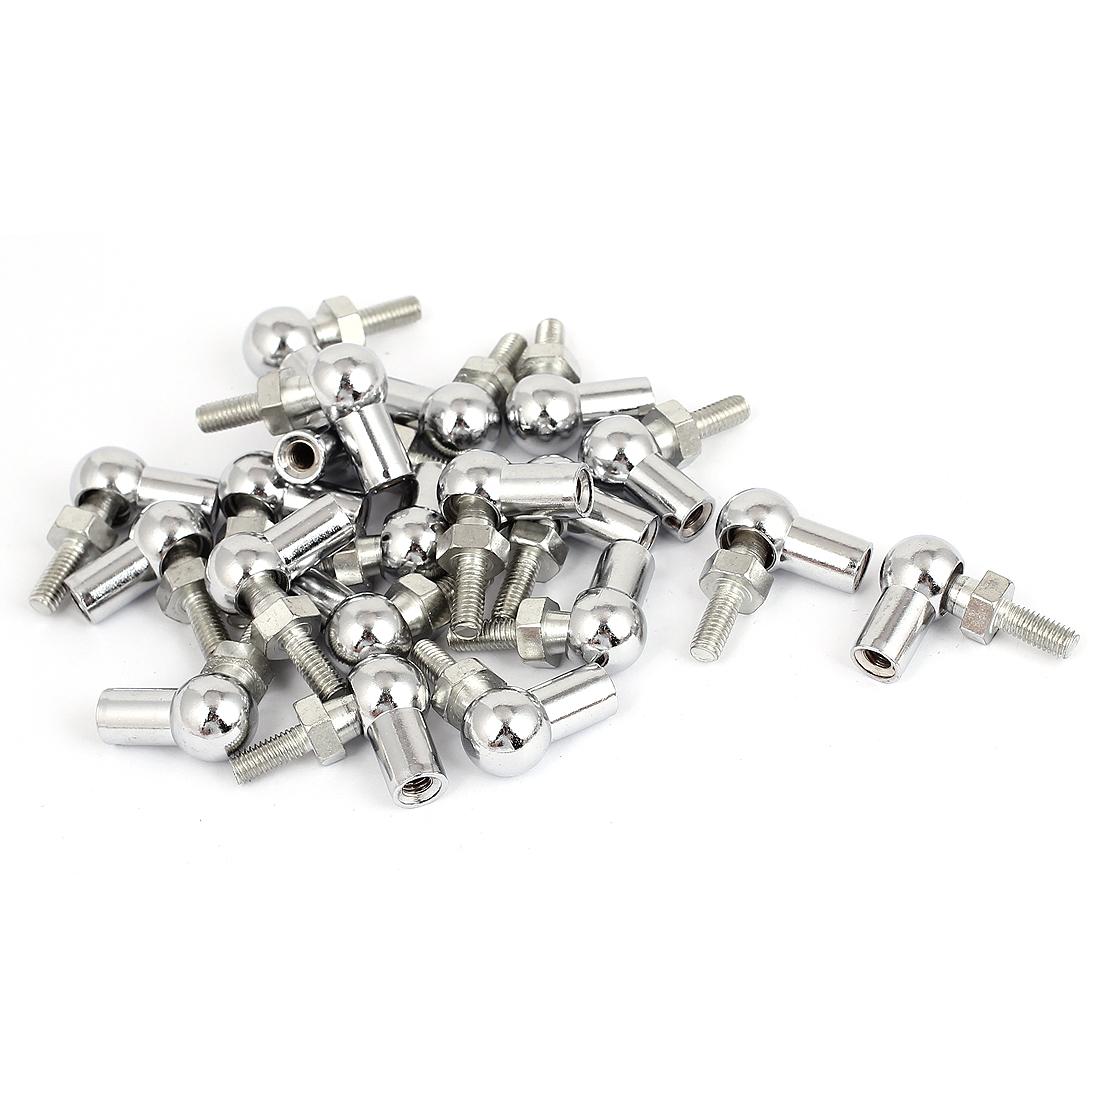 6mm Female 6mm Male Thread Dia L-Shape Rod End Bearing Silver Tone 20Pcs